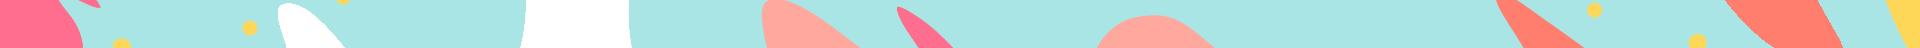 banner1.1